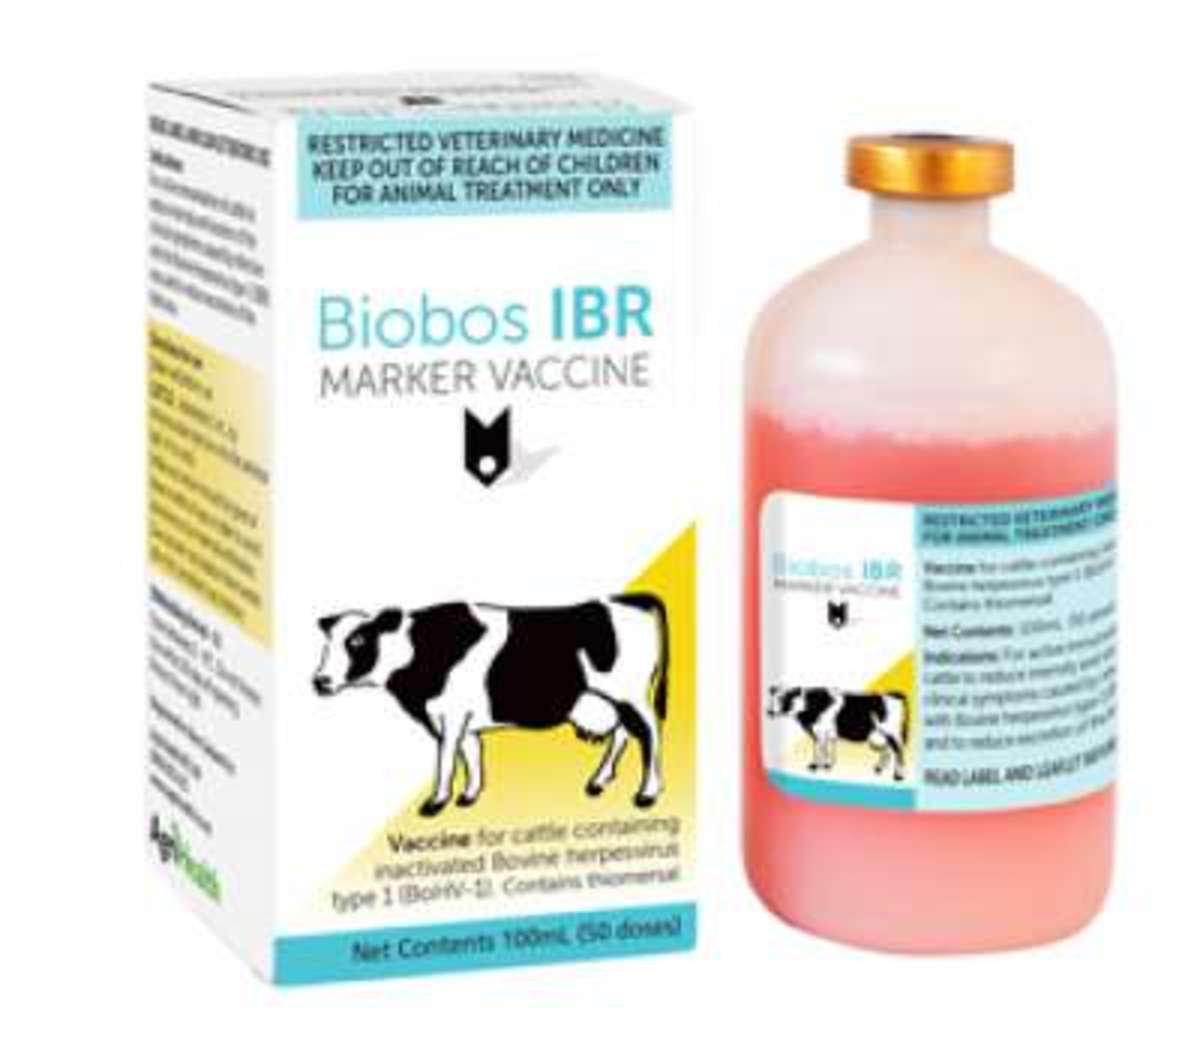 IBR marker vaccine.